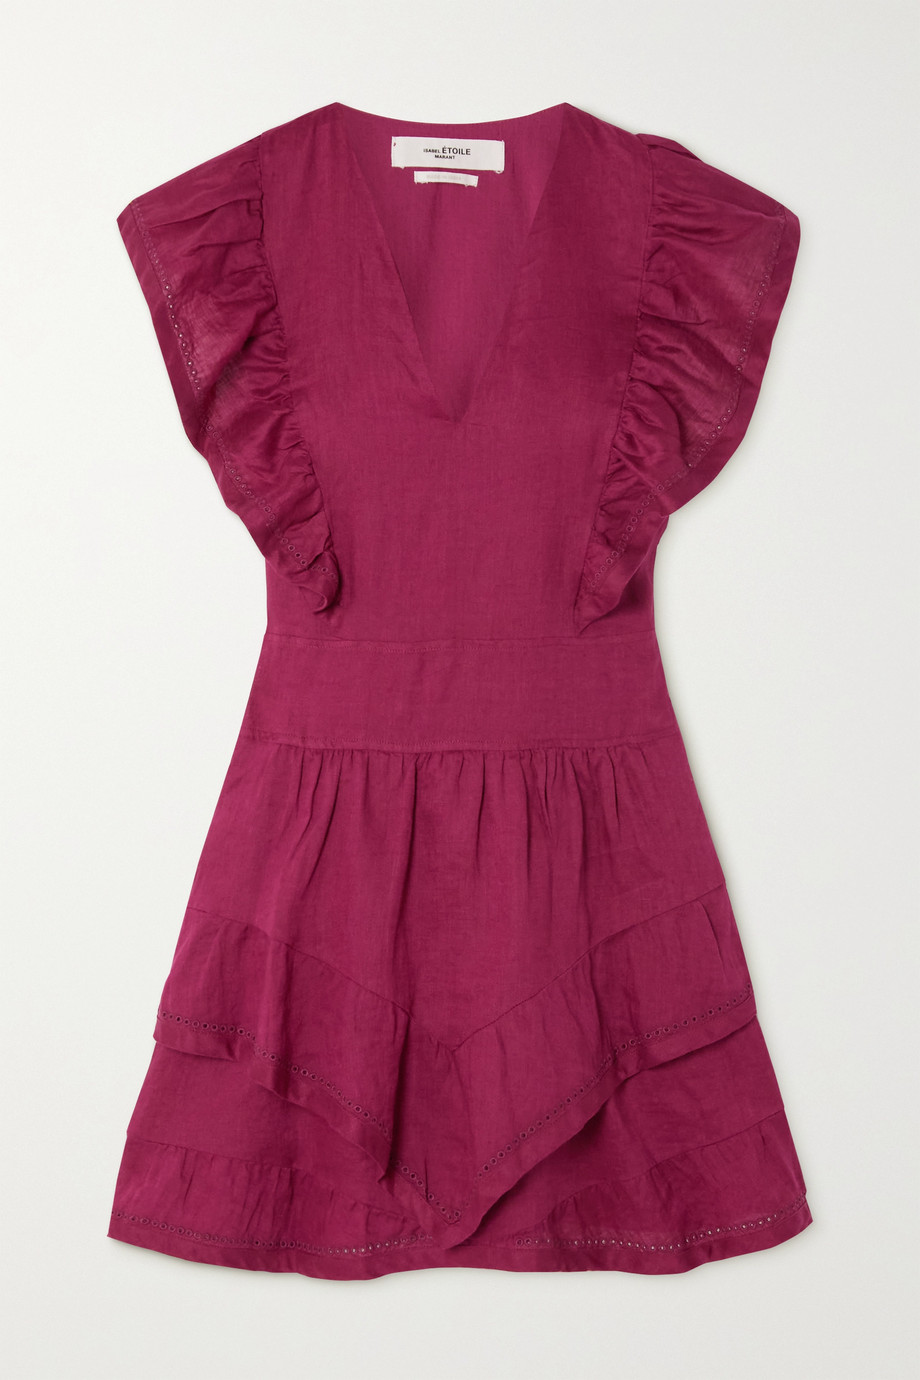 Isabel Marant Étoile Audreyo ruffled broderie anglaise cotton mini dress